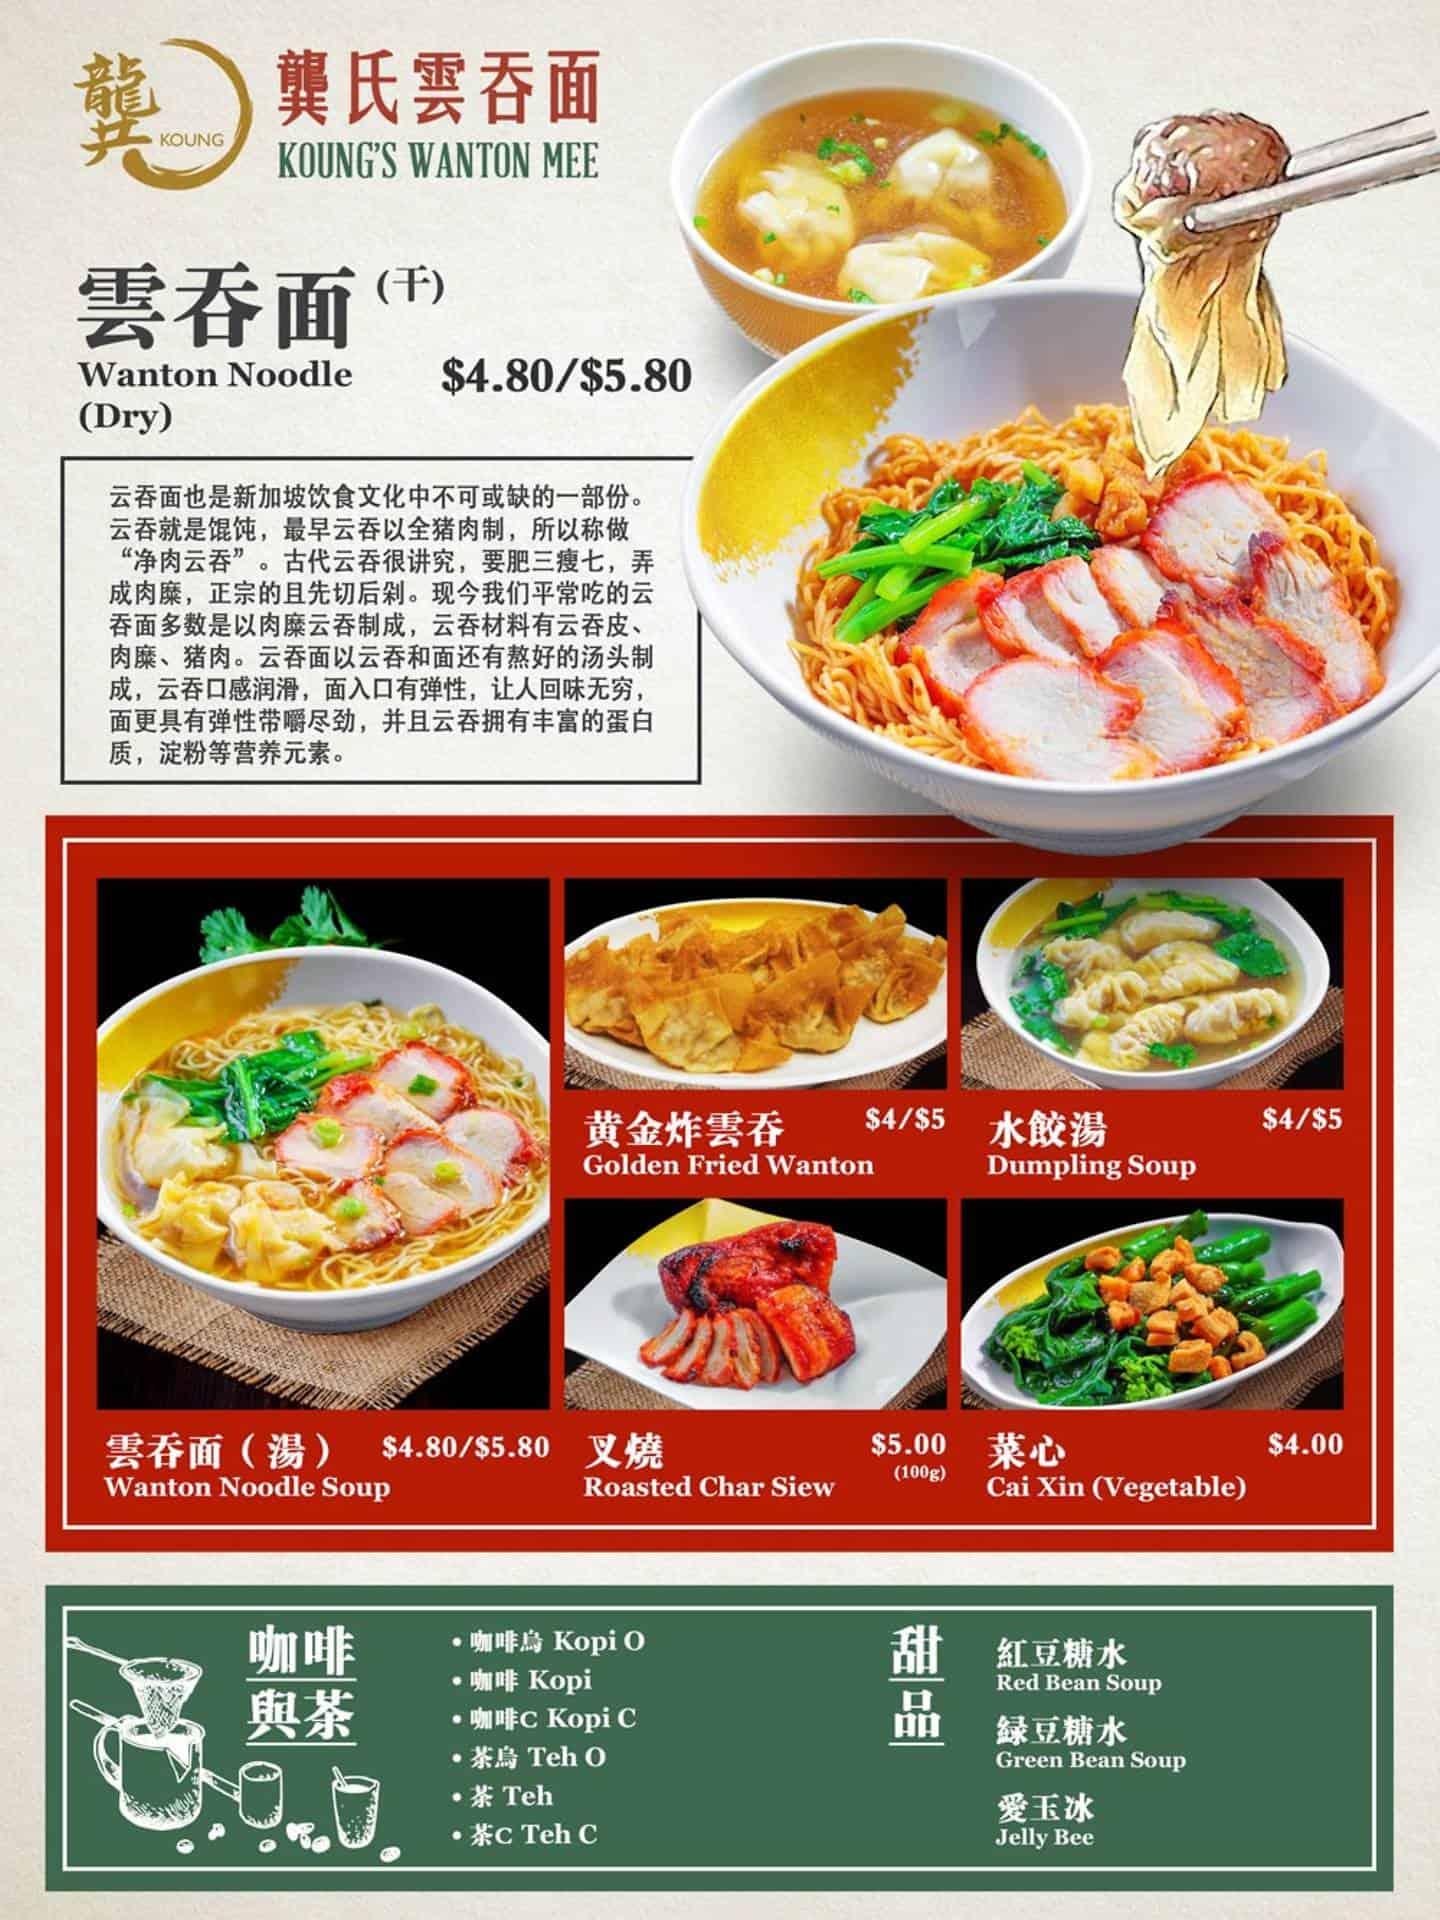 Koung's Wanton Mee Menu